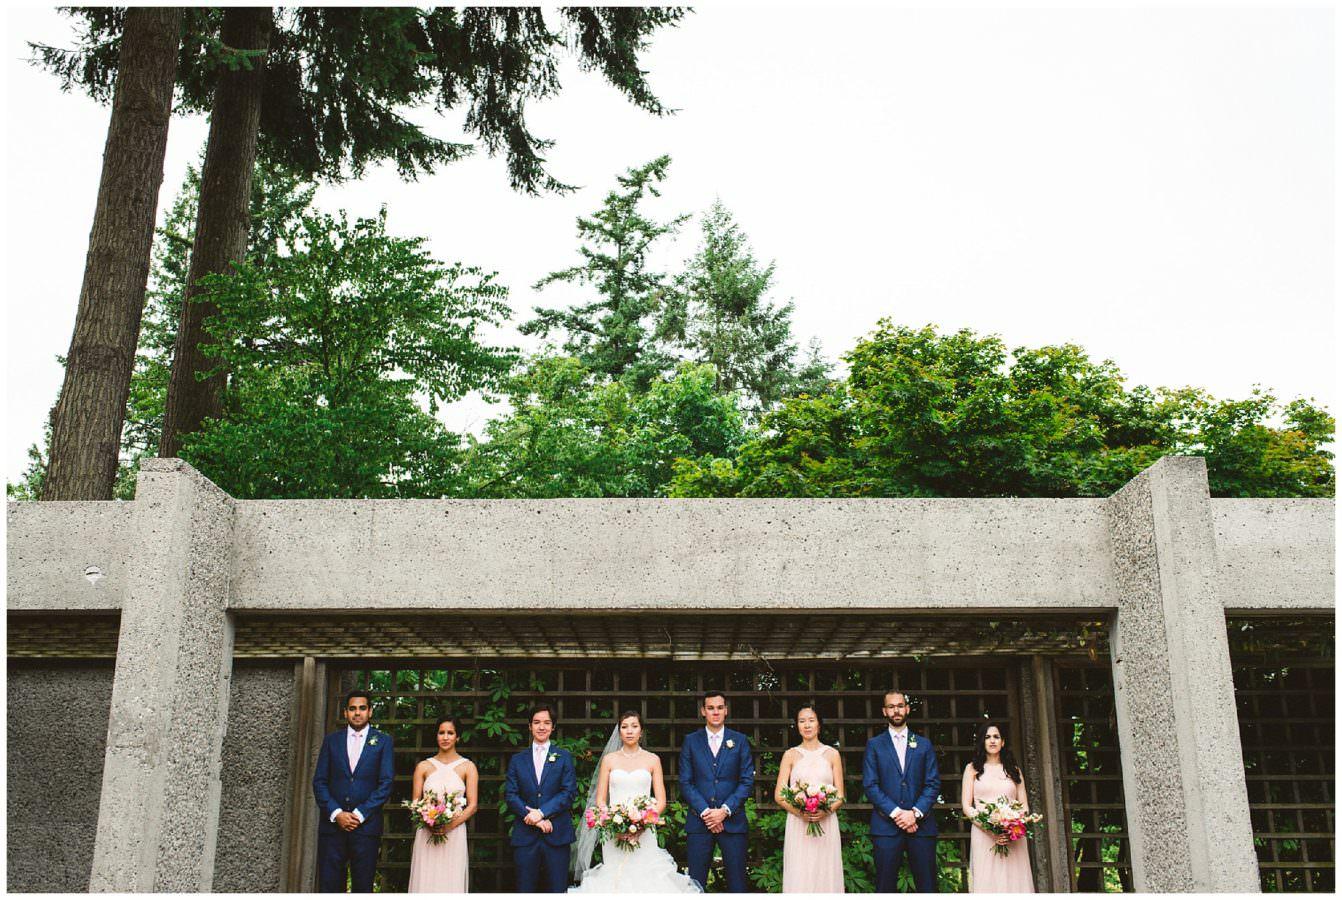 CecilGreenParkhouseWedding_Vancouver_RonnieLeeHillPhotography_1070